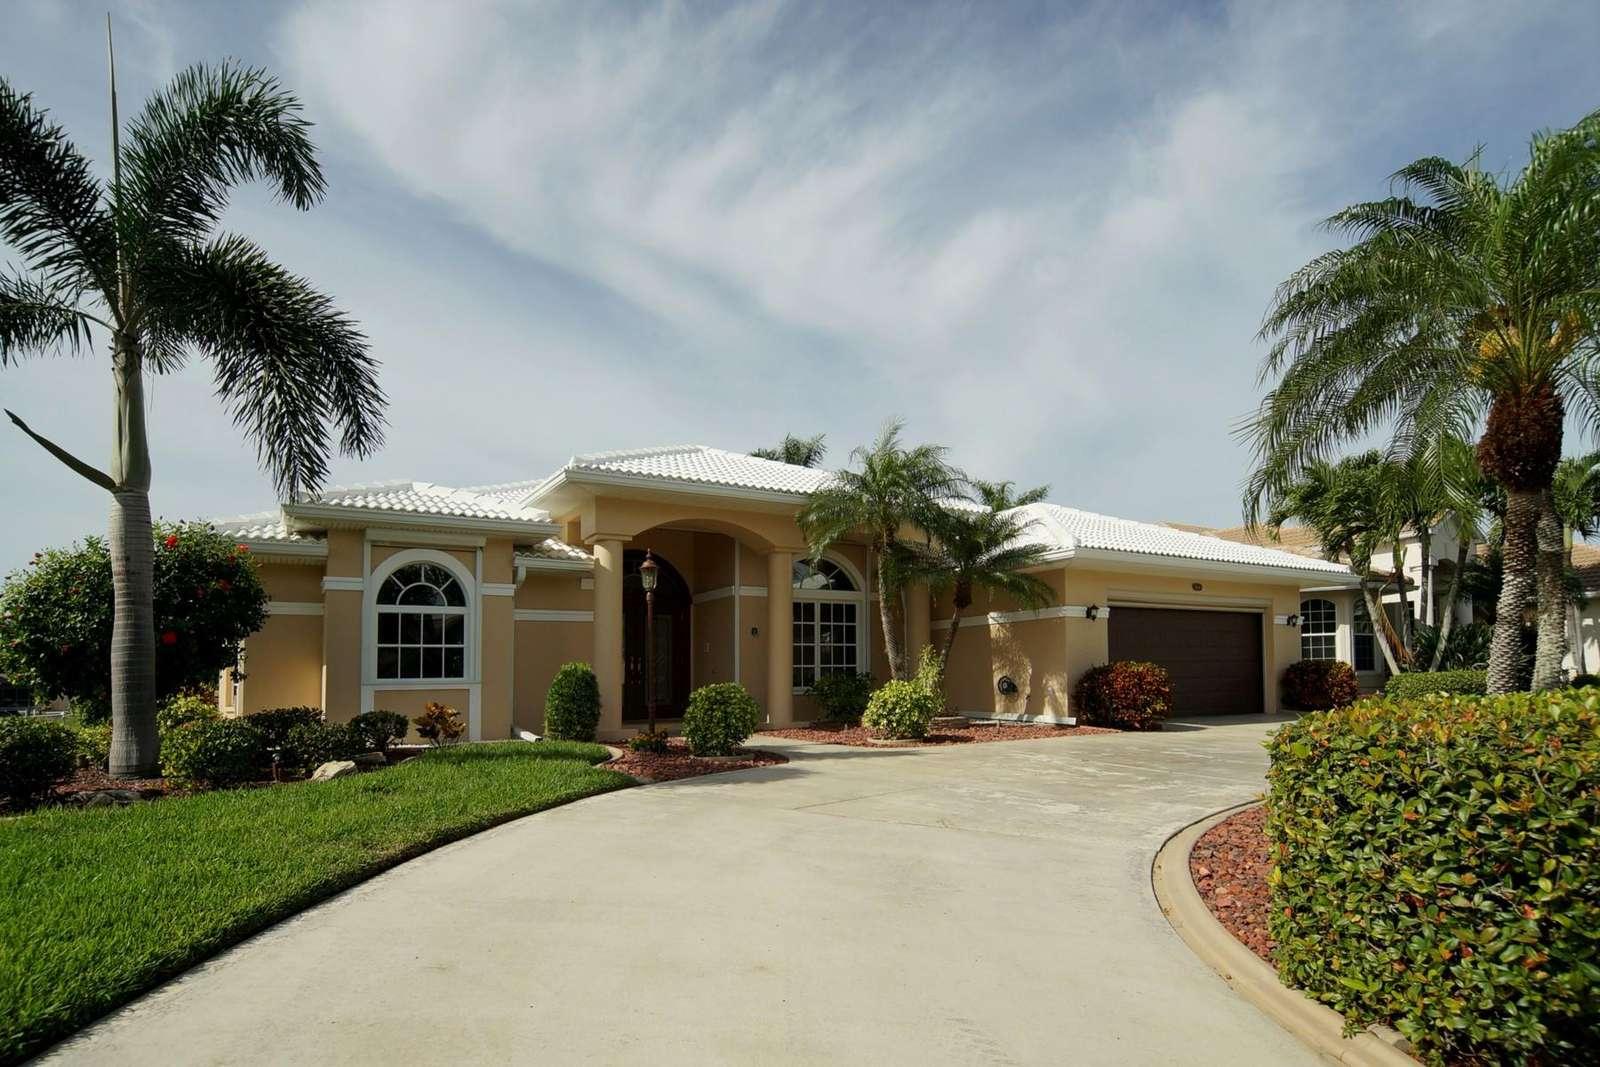 Wischis Florida Home - Vacation Rentals I Property Management I Real Estate